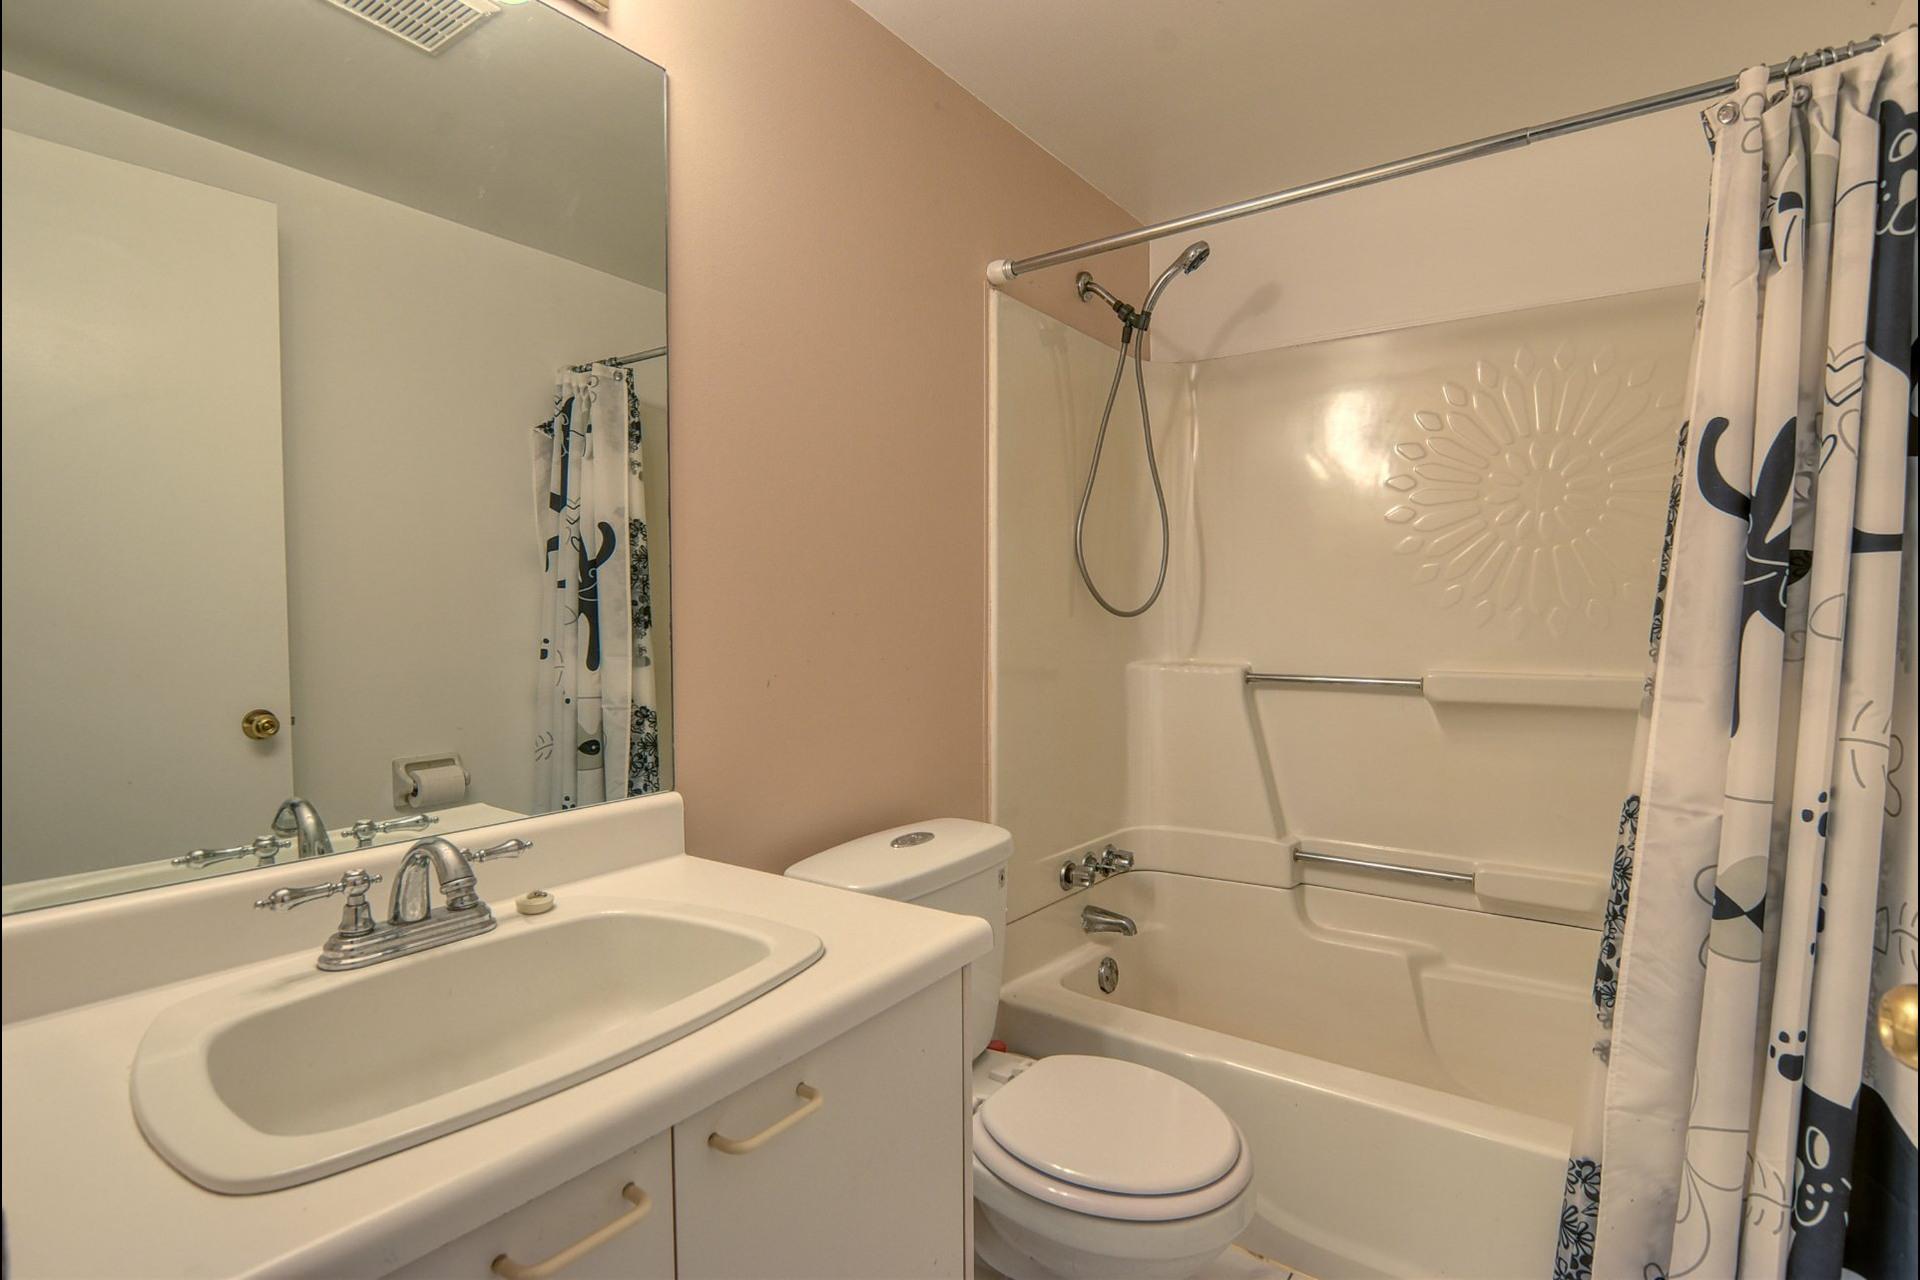 image 16 - Apartment For sale Repentigny Repentigny  - 5 rooms